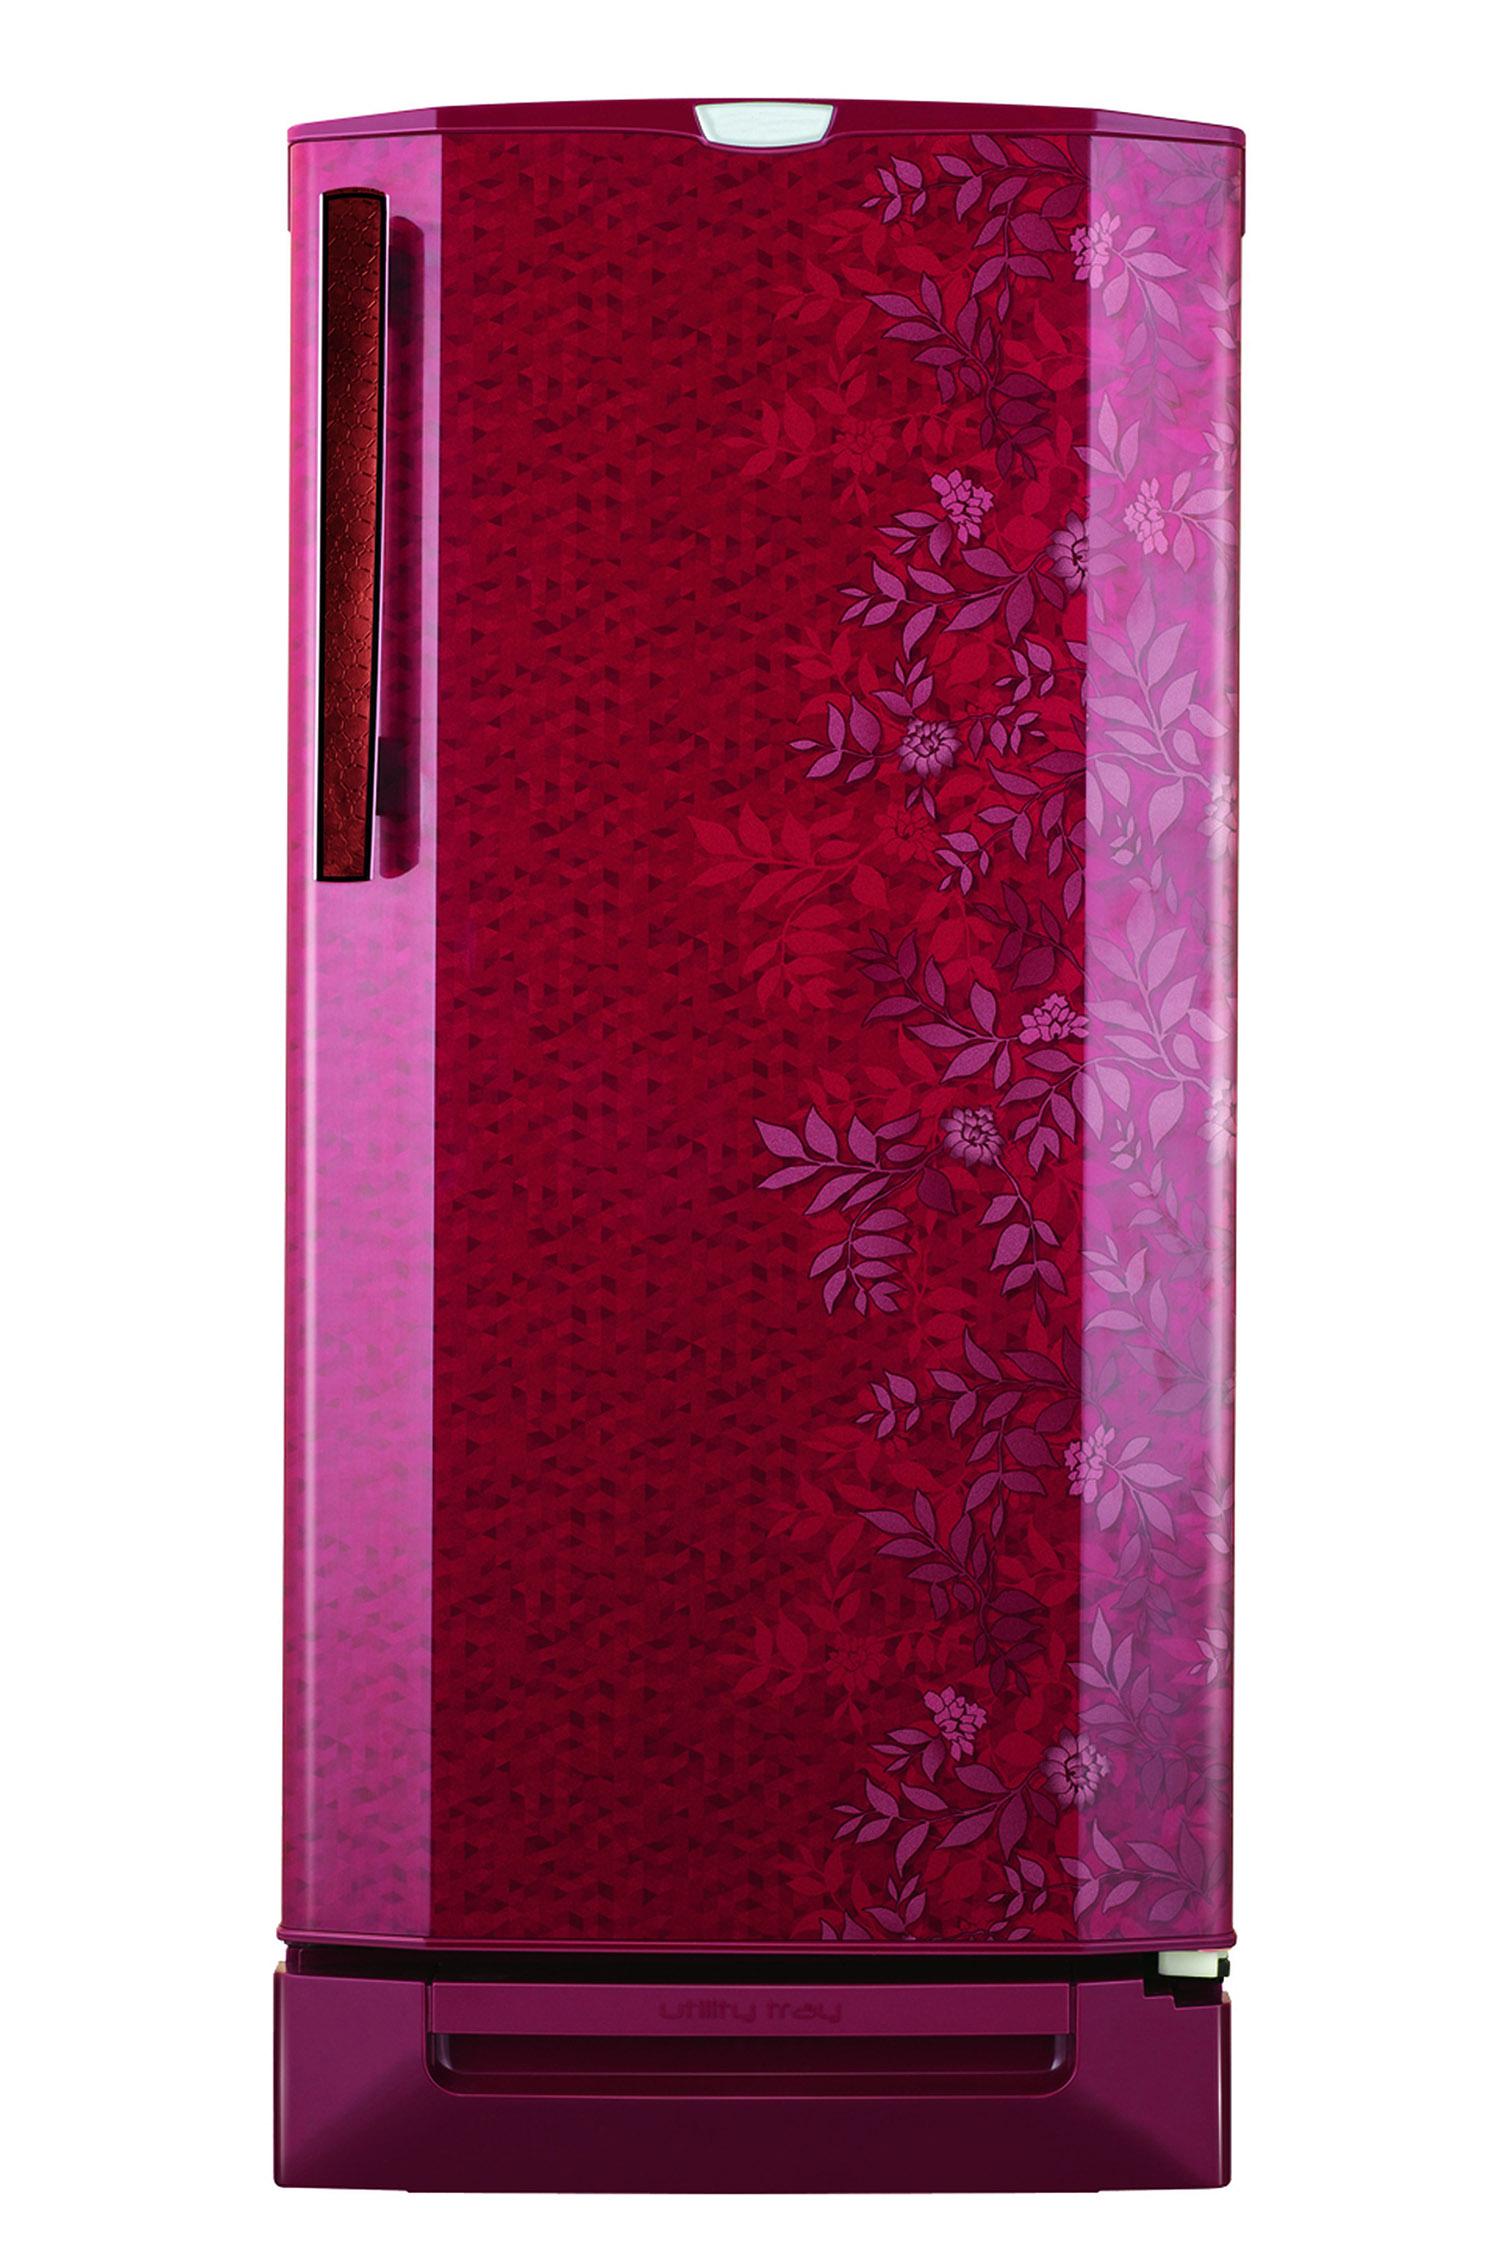 Decorative refrigerator in pink